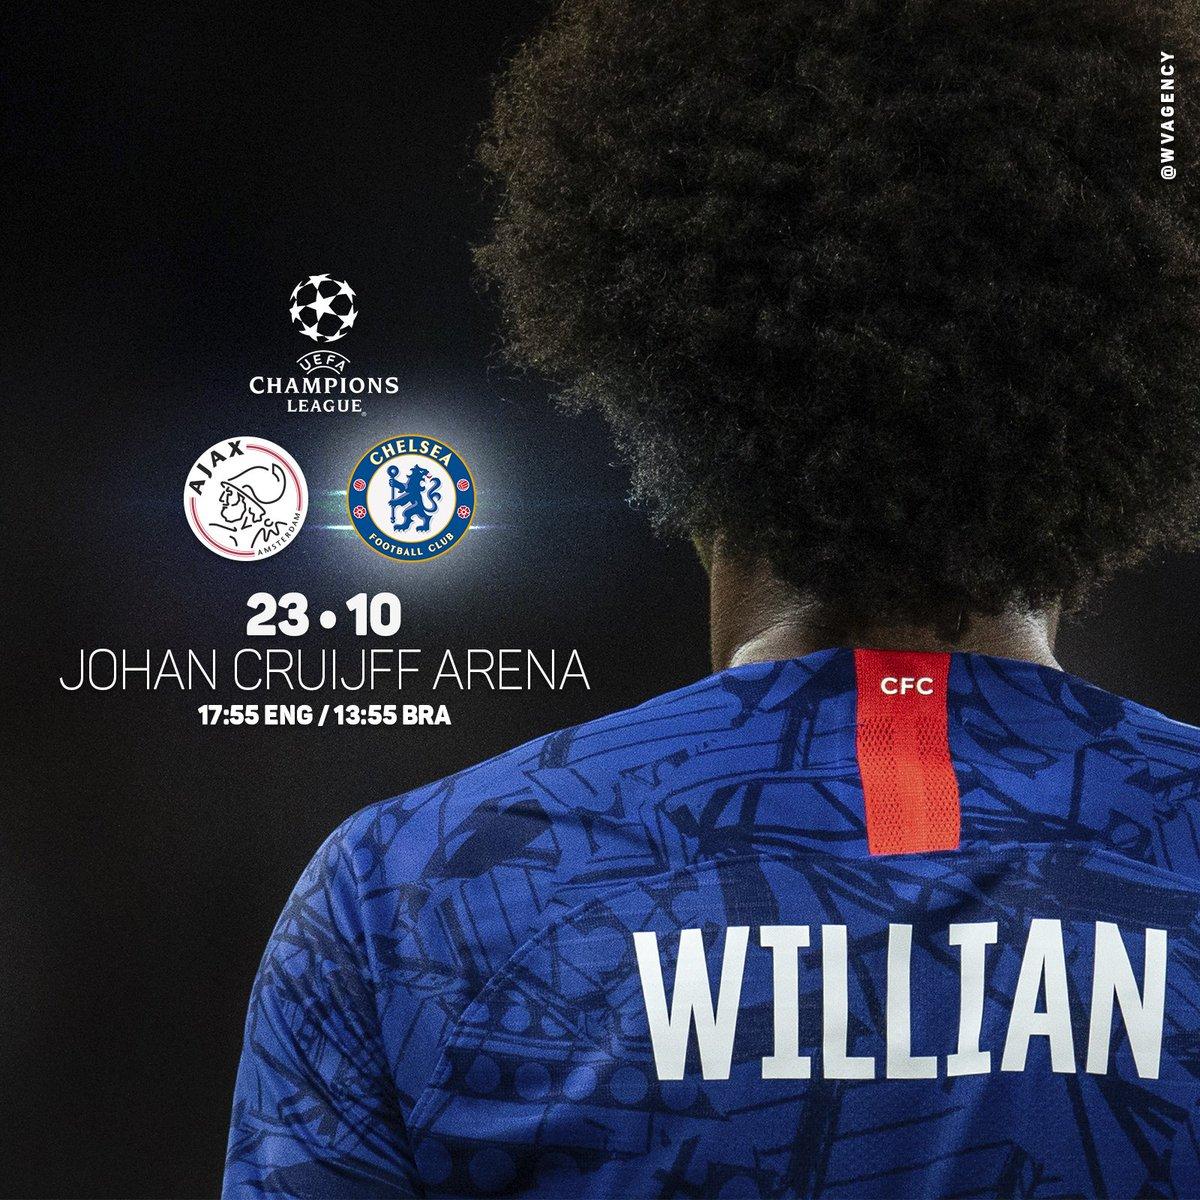 Matchday!!! 💪🏿⚽️💙#uefachampionsleague #CFC #W10 #amsterda #comeonchelsea